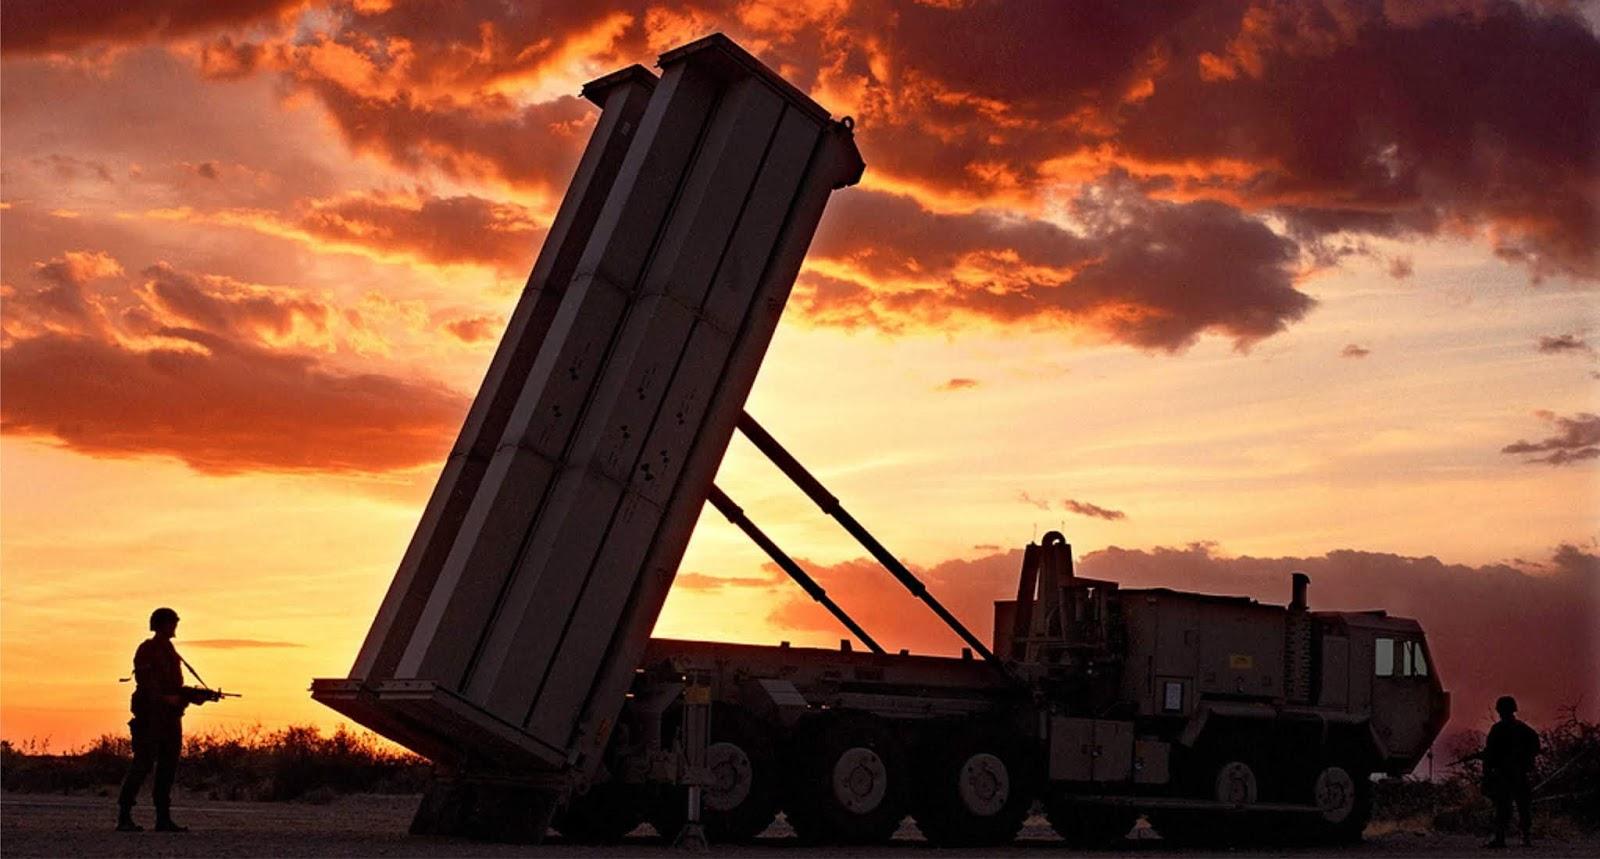 AS siap menguji coba rudal yang sebelumnya dilarang oleh INF pada bulan Agustus